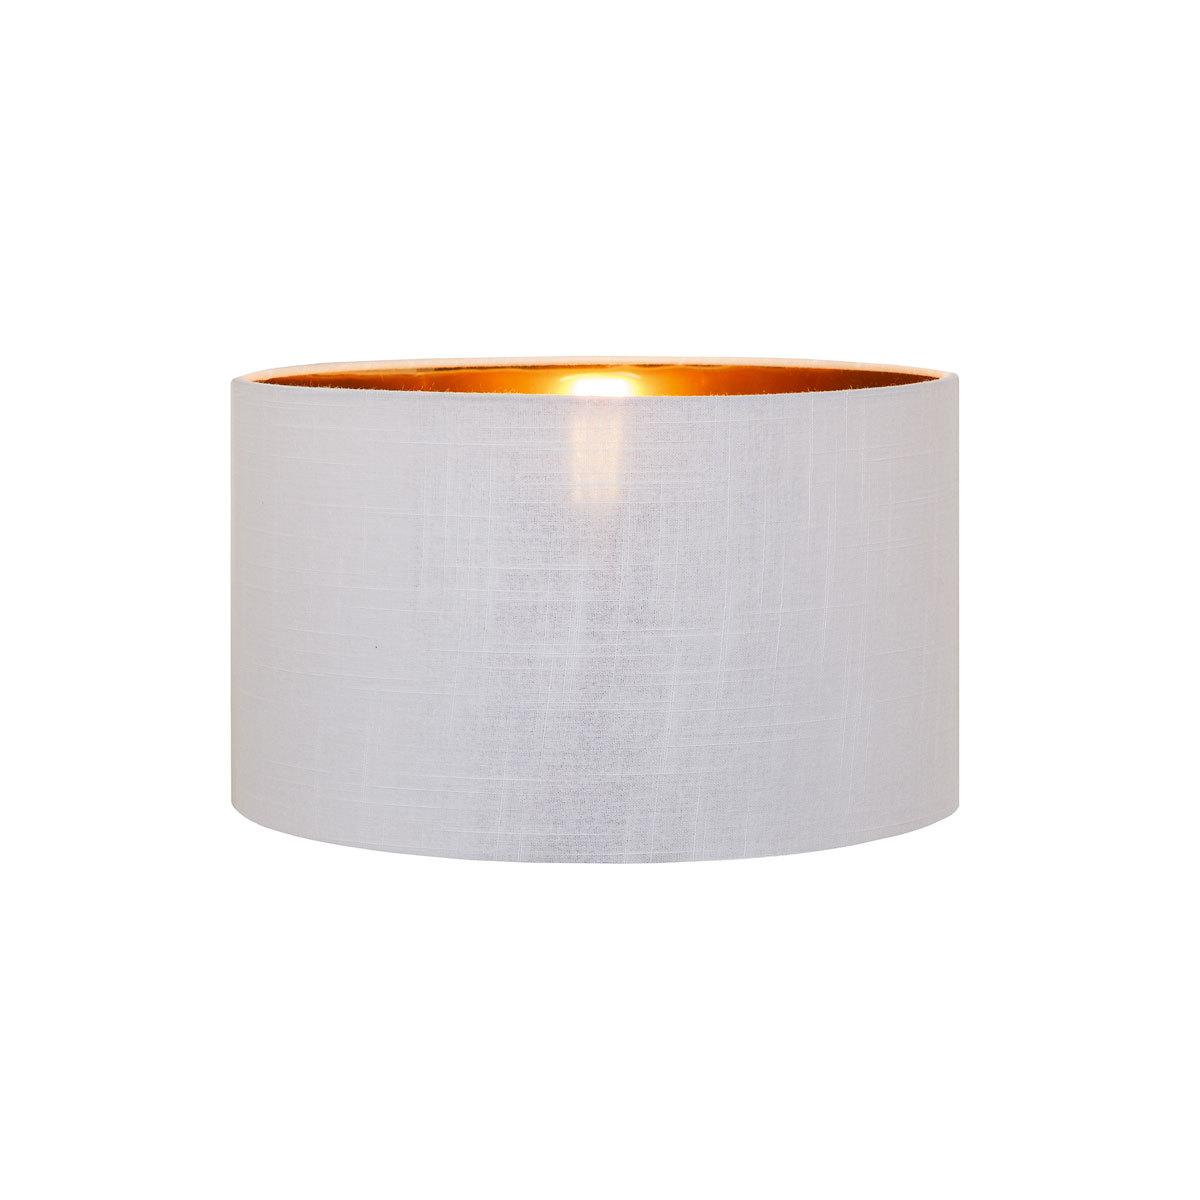 Абажур Loft It Nordic LOFT1700-SWH, белый с золотом, текстиль - фото 1